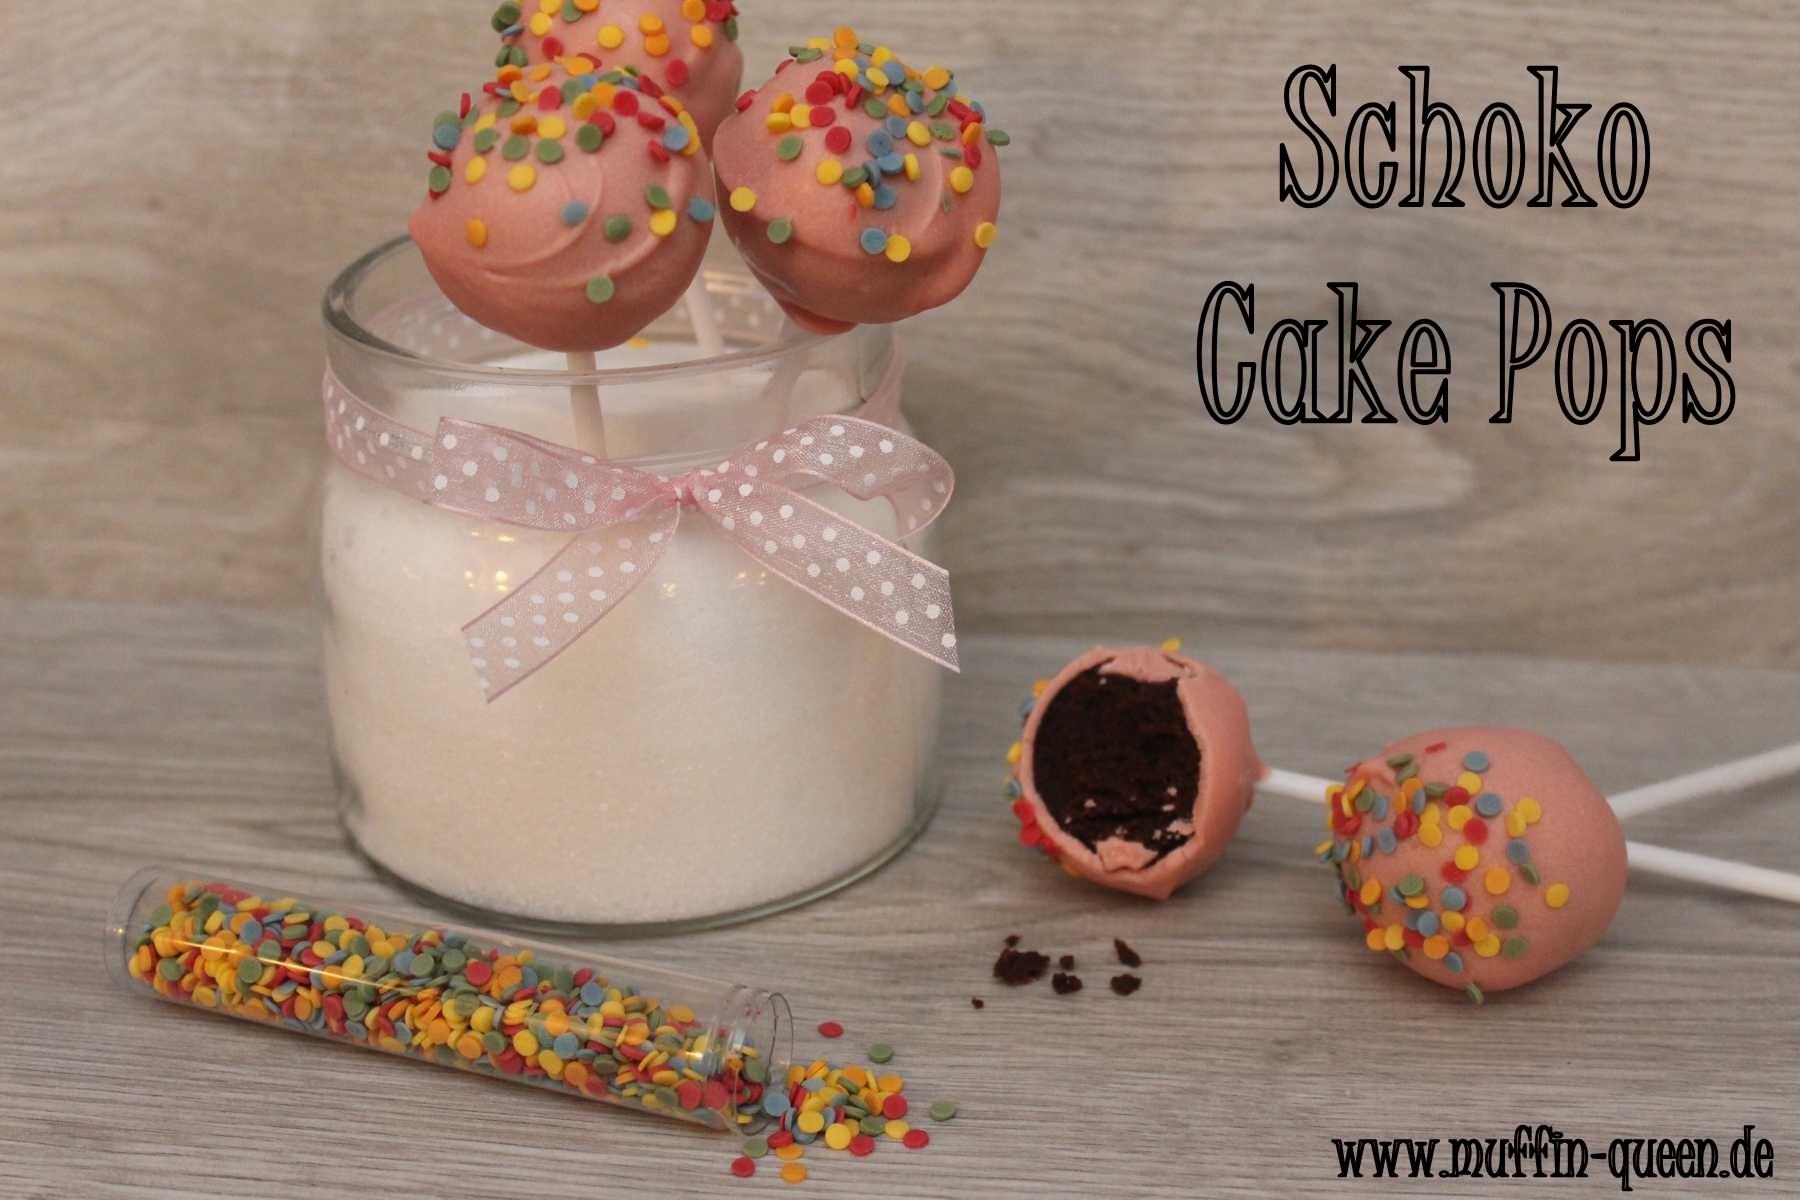 schoko cake pops einfach lecker muffin queen. Black Bedroom Furniture Sets. Home Design Ideas